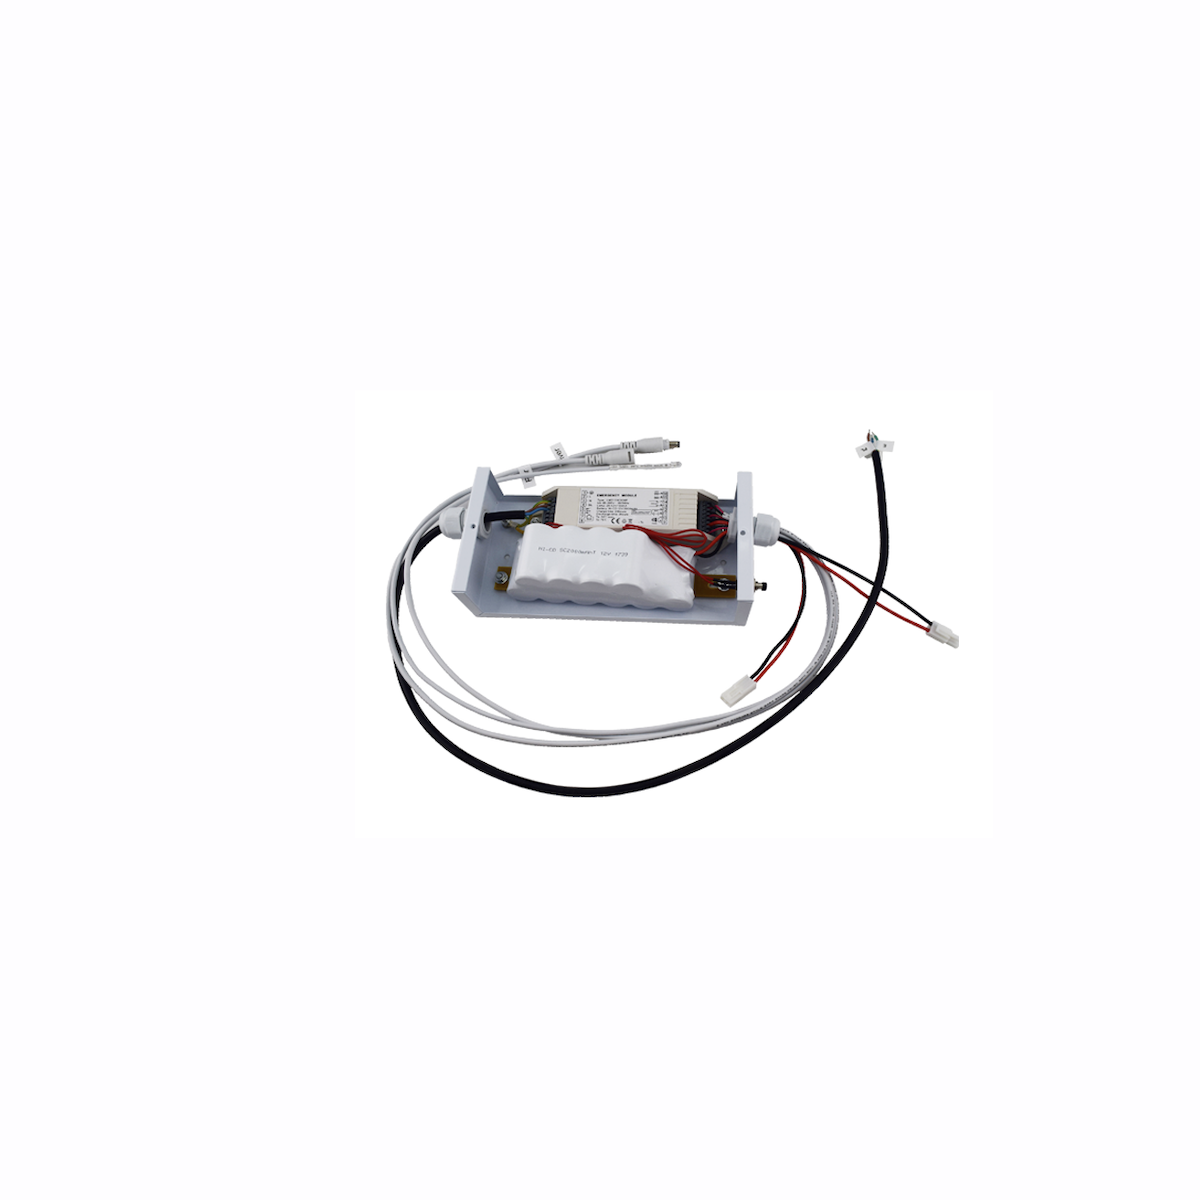 1~25W 15-90V DC LED Panel Emergency Kit